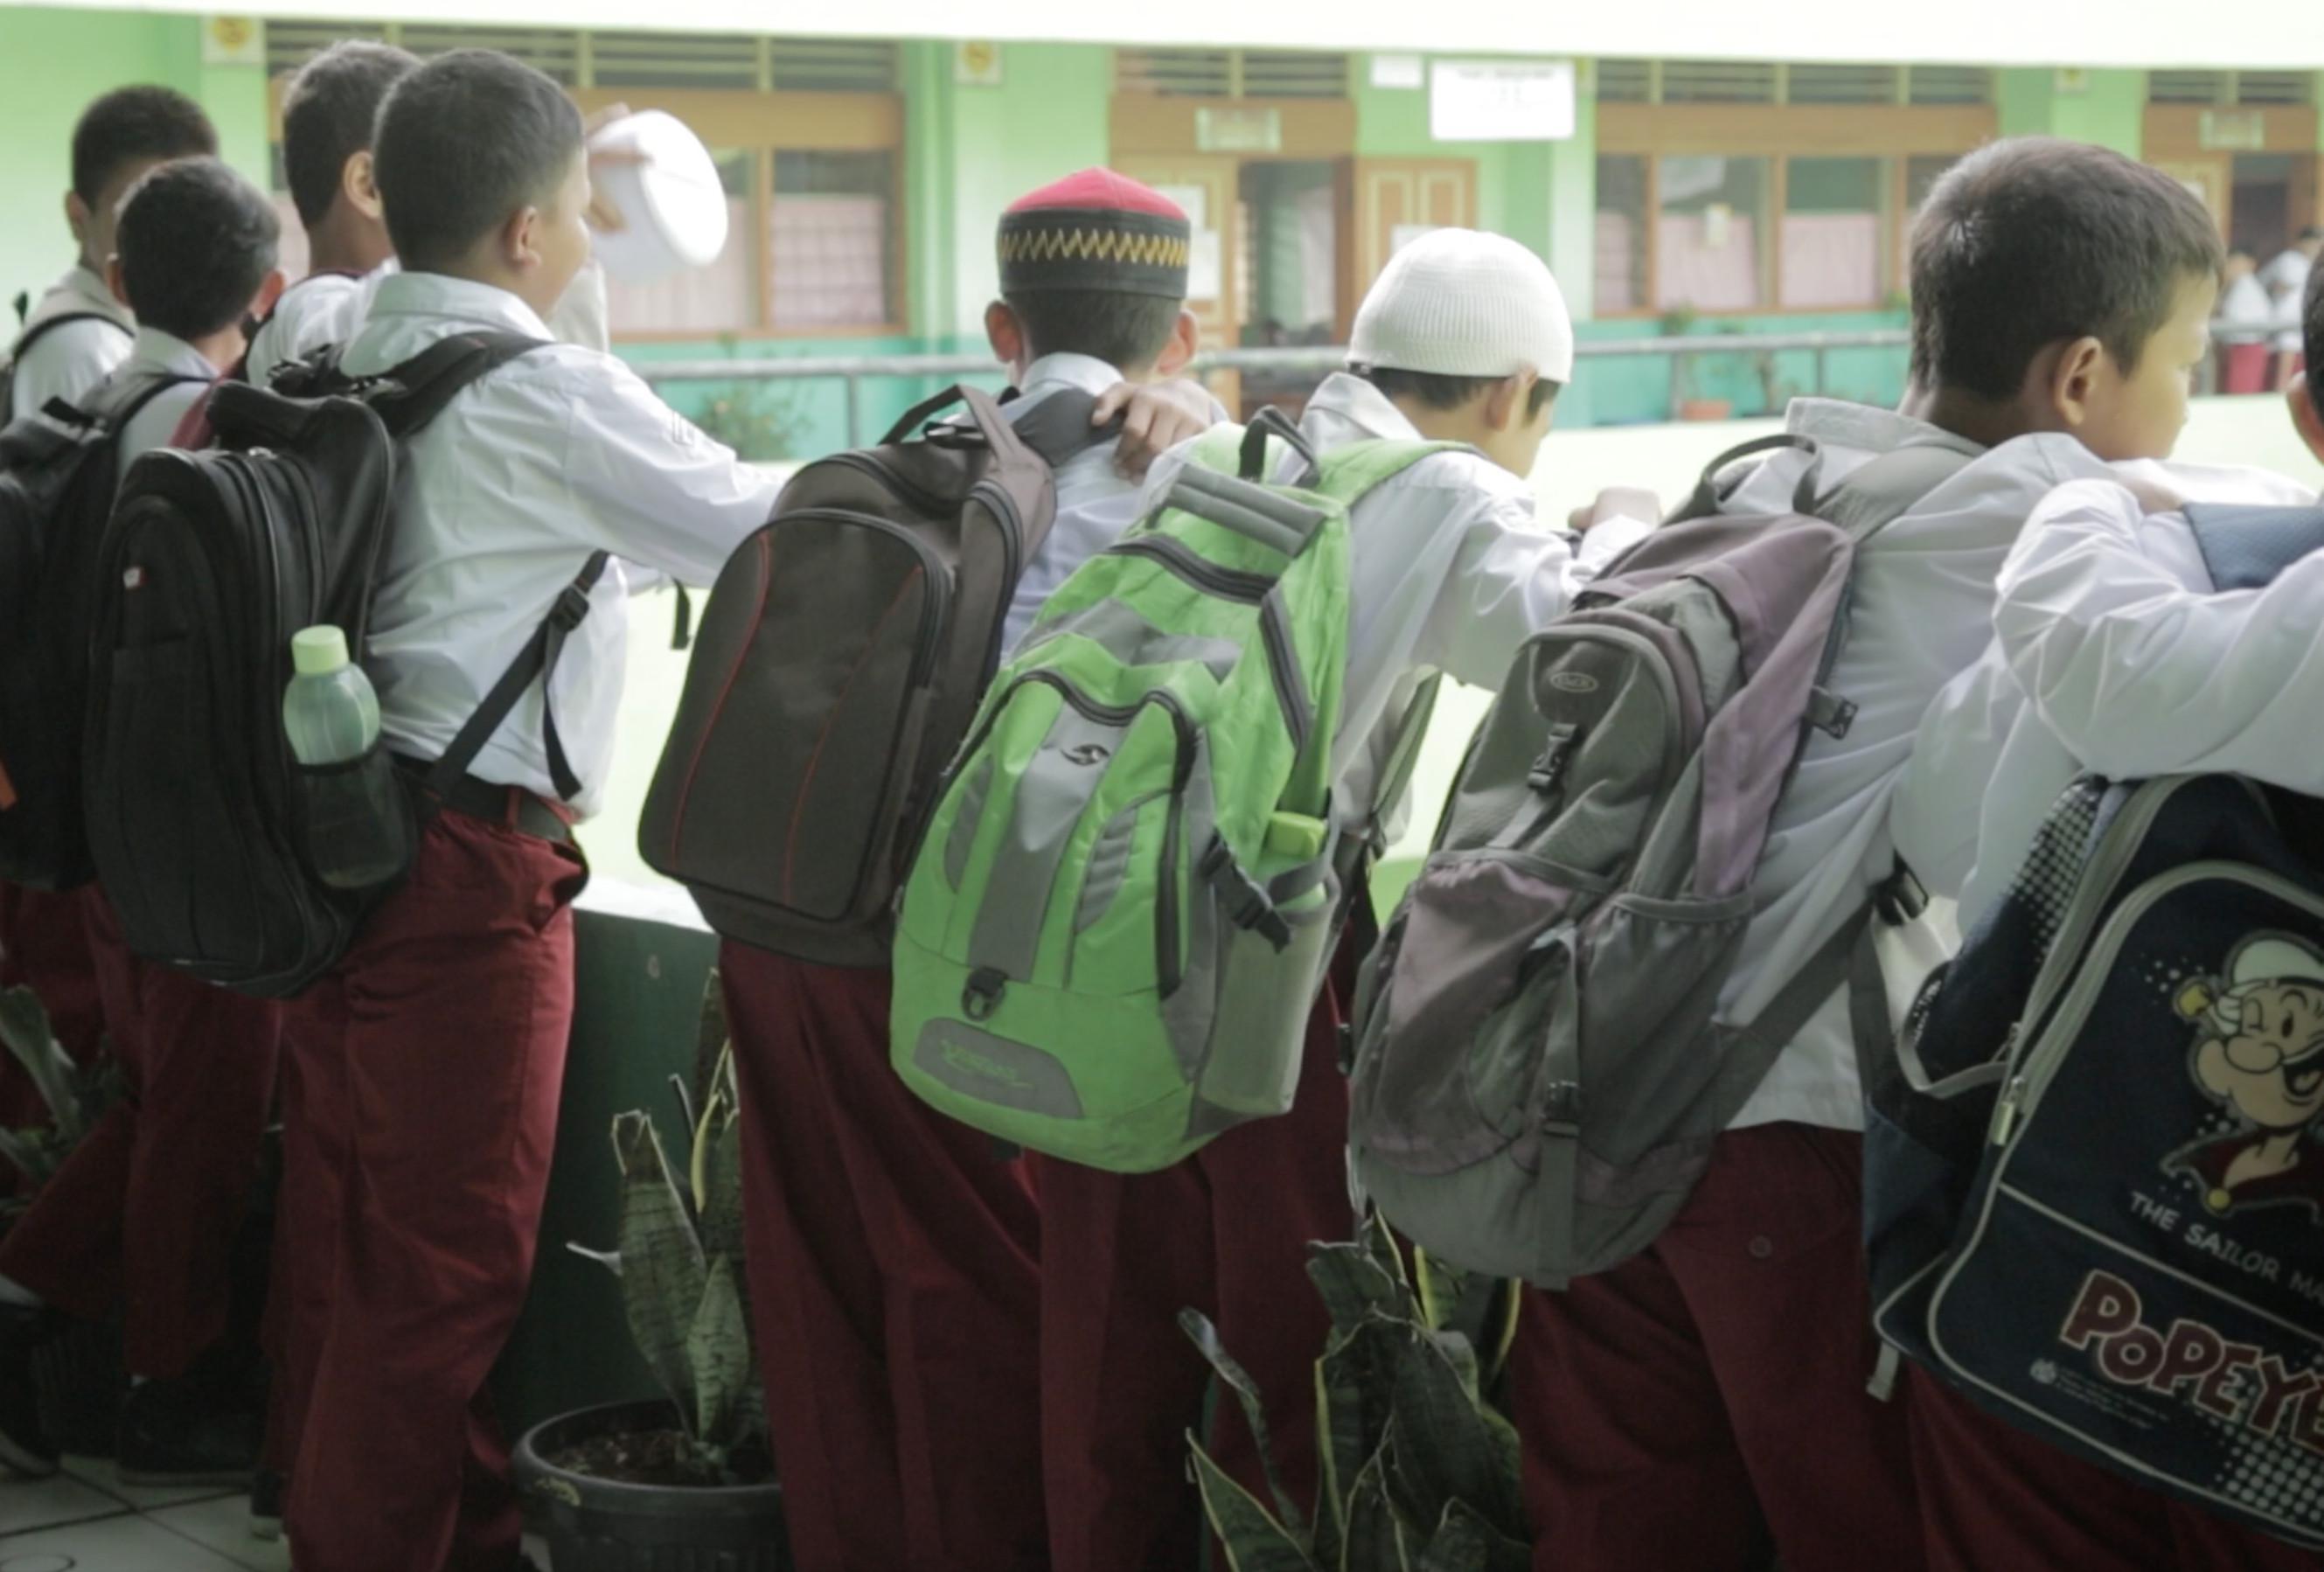 Sejumlah Anak SD Menggendong Tas (Liputan6.com/Mochamad Khadafi)